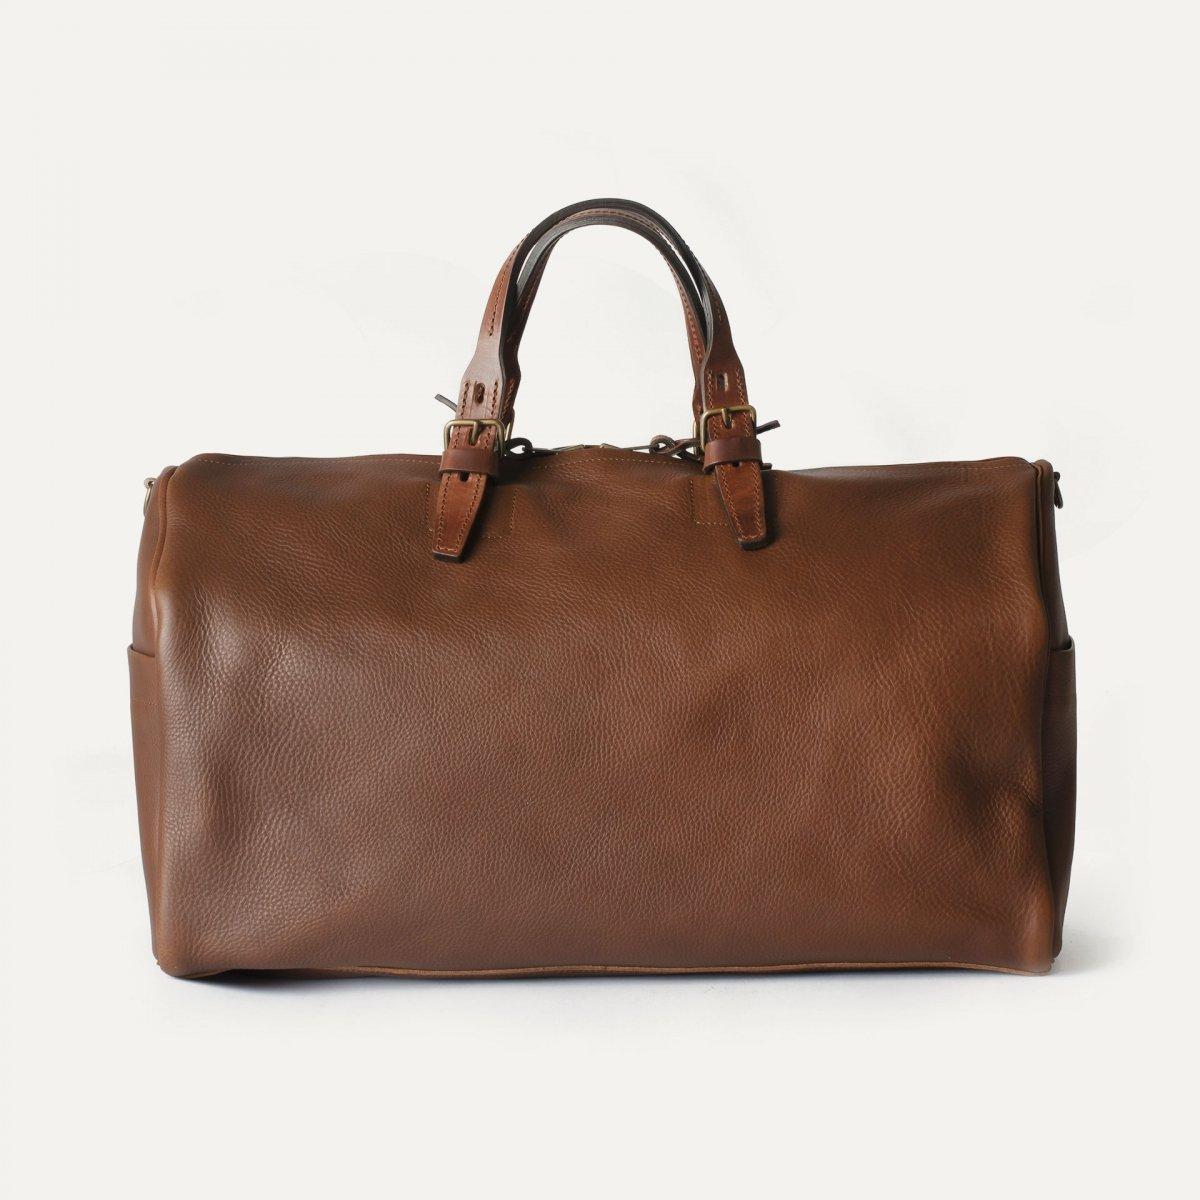 Hobo Travel bag - Cuba Libre (image n°3)